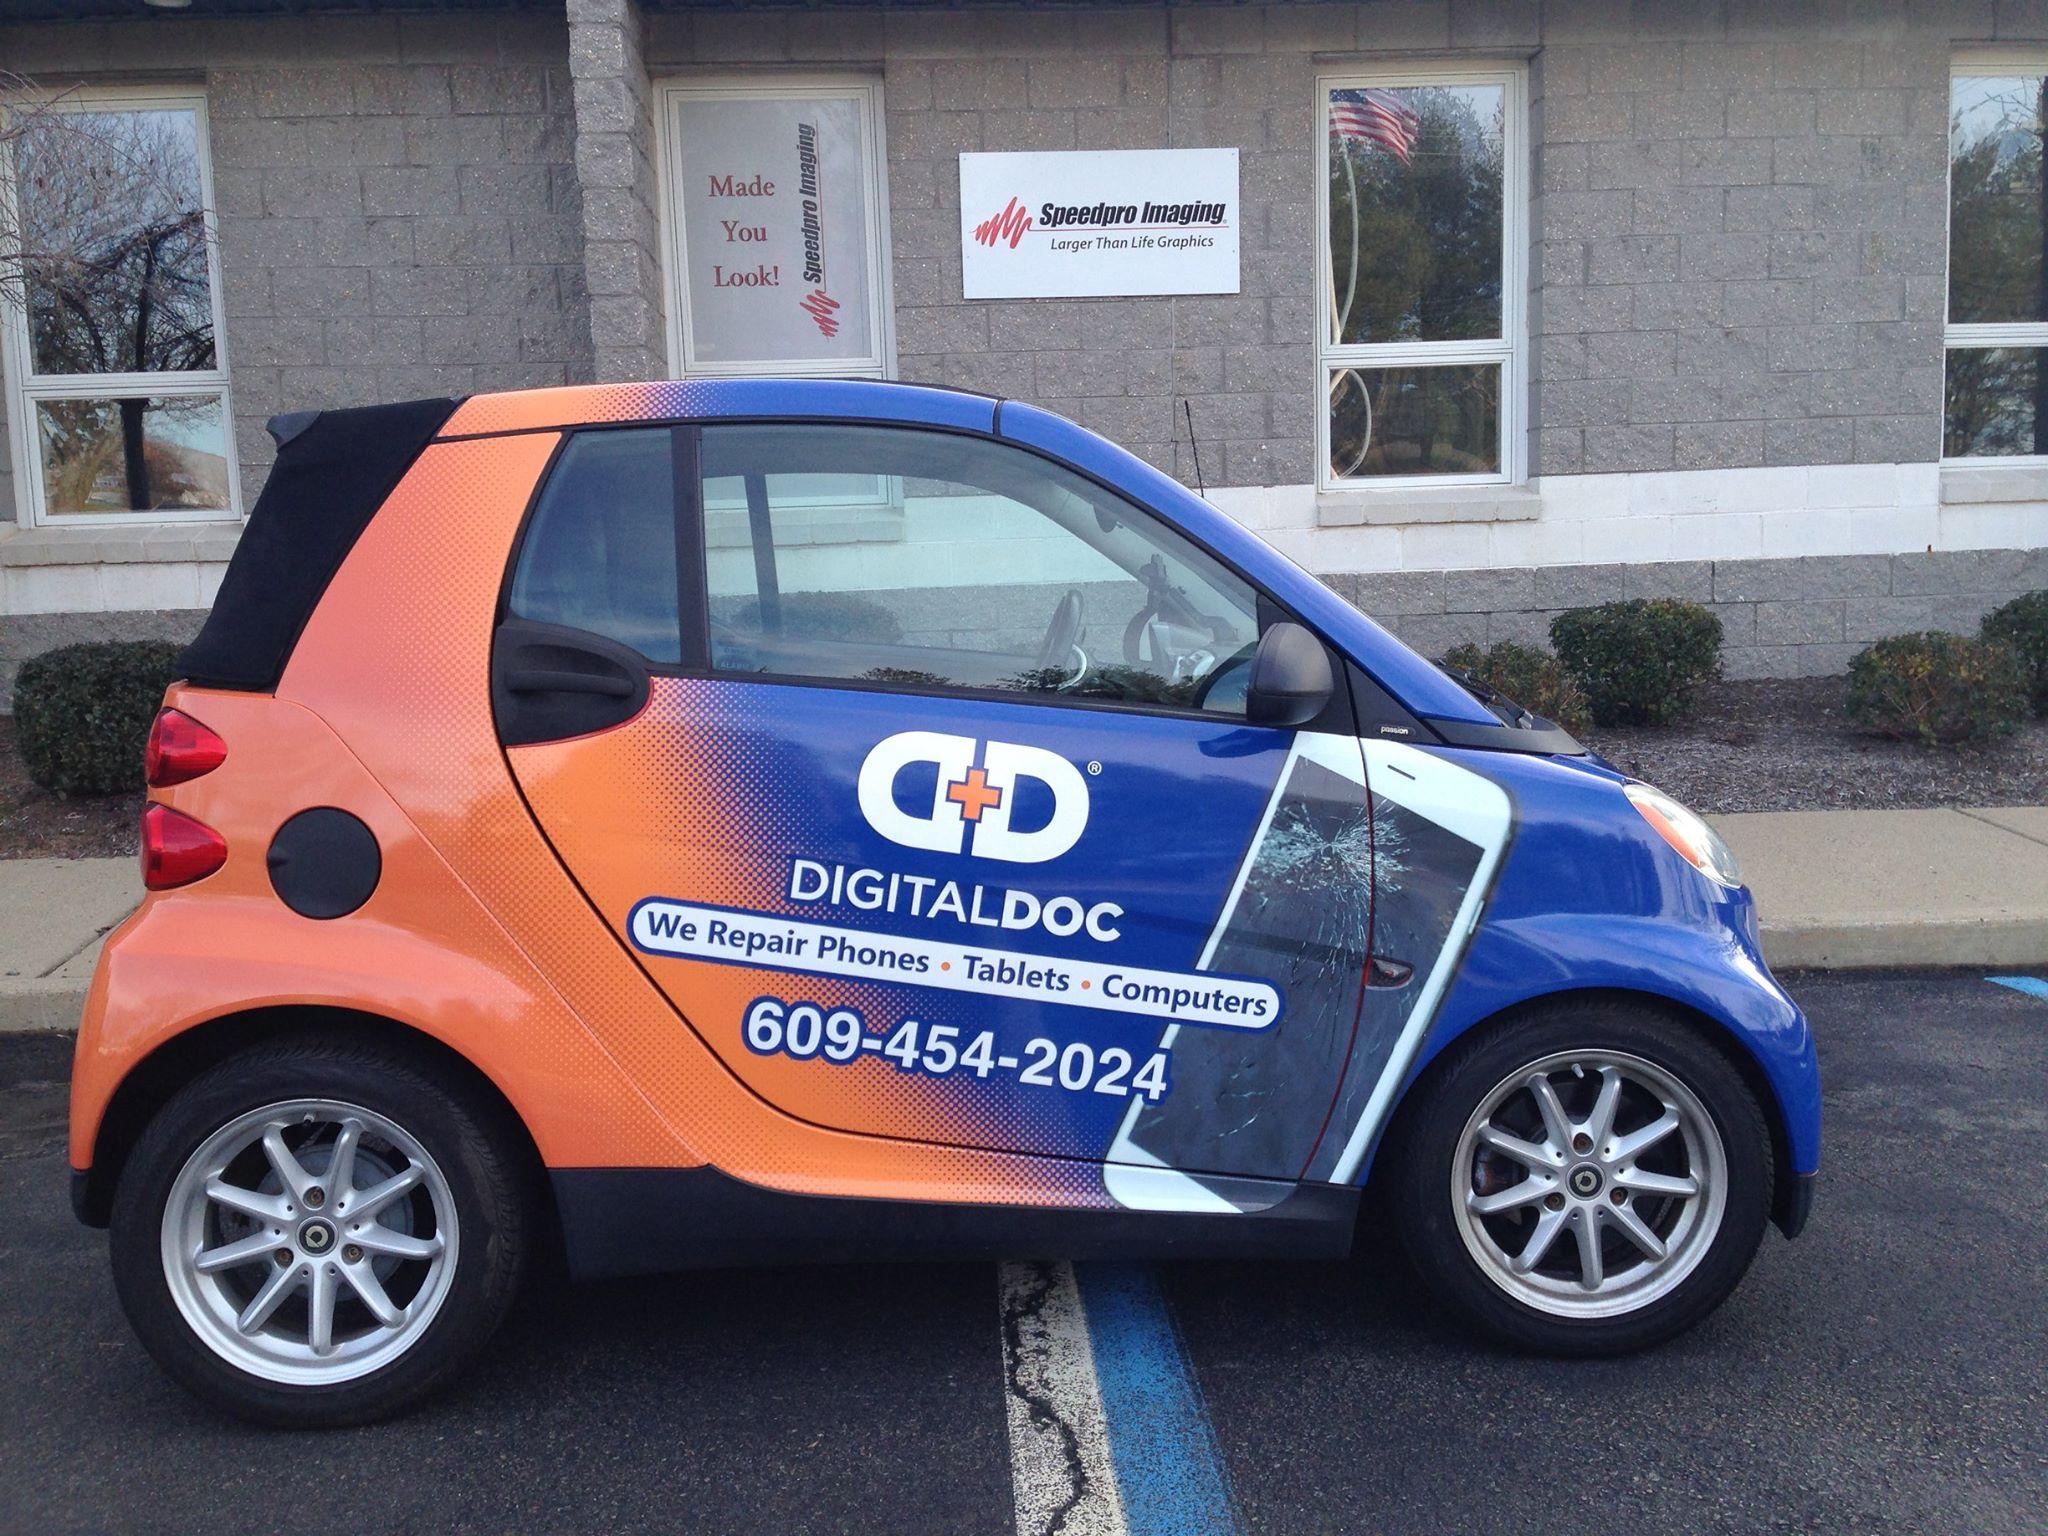 Digital Doc Vehicle Wrap